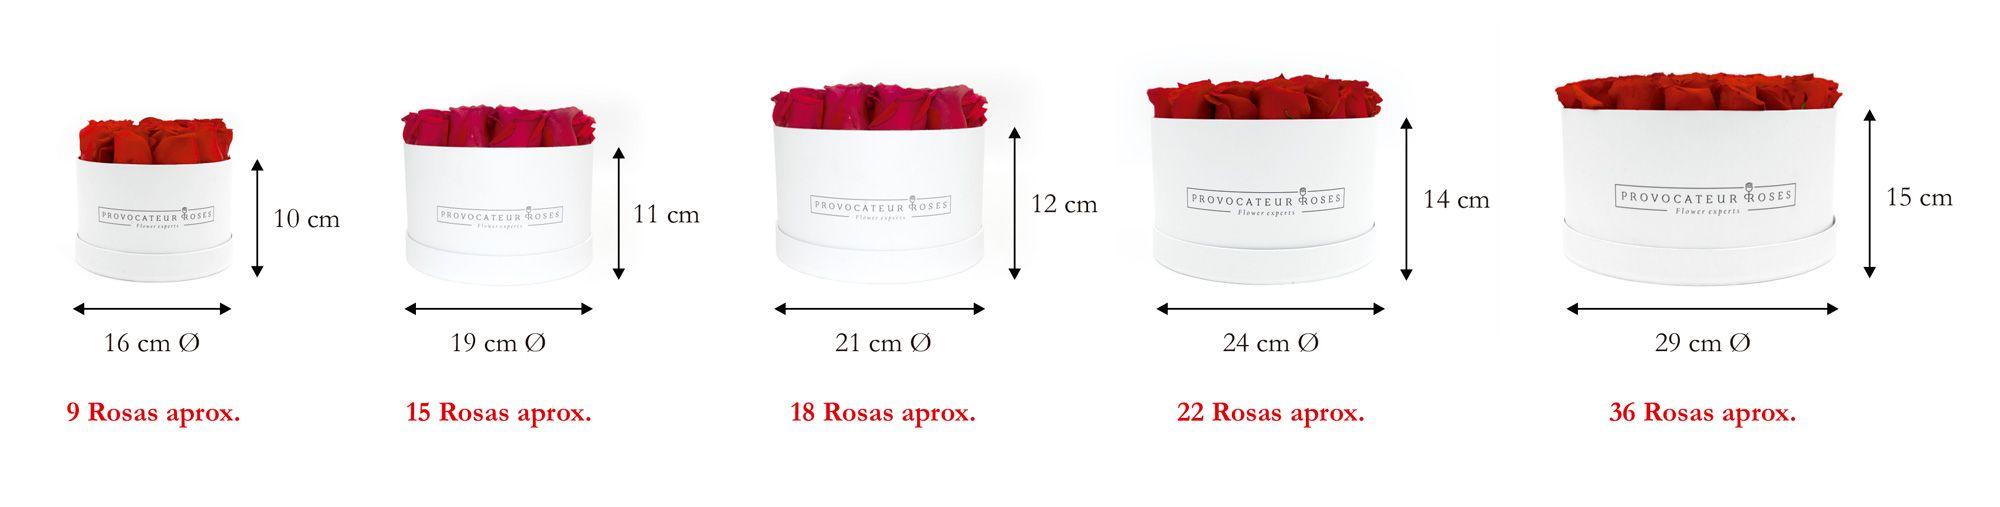 caja-rosas-redonda